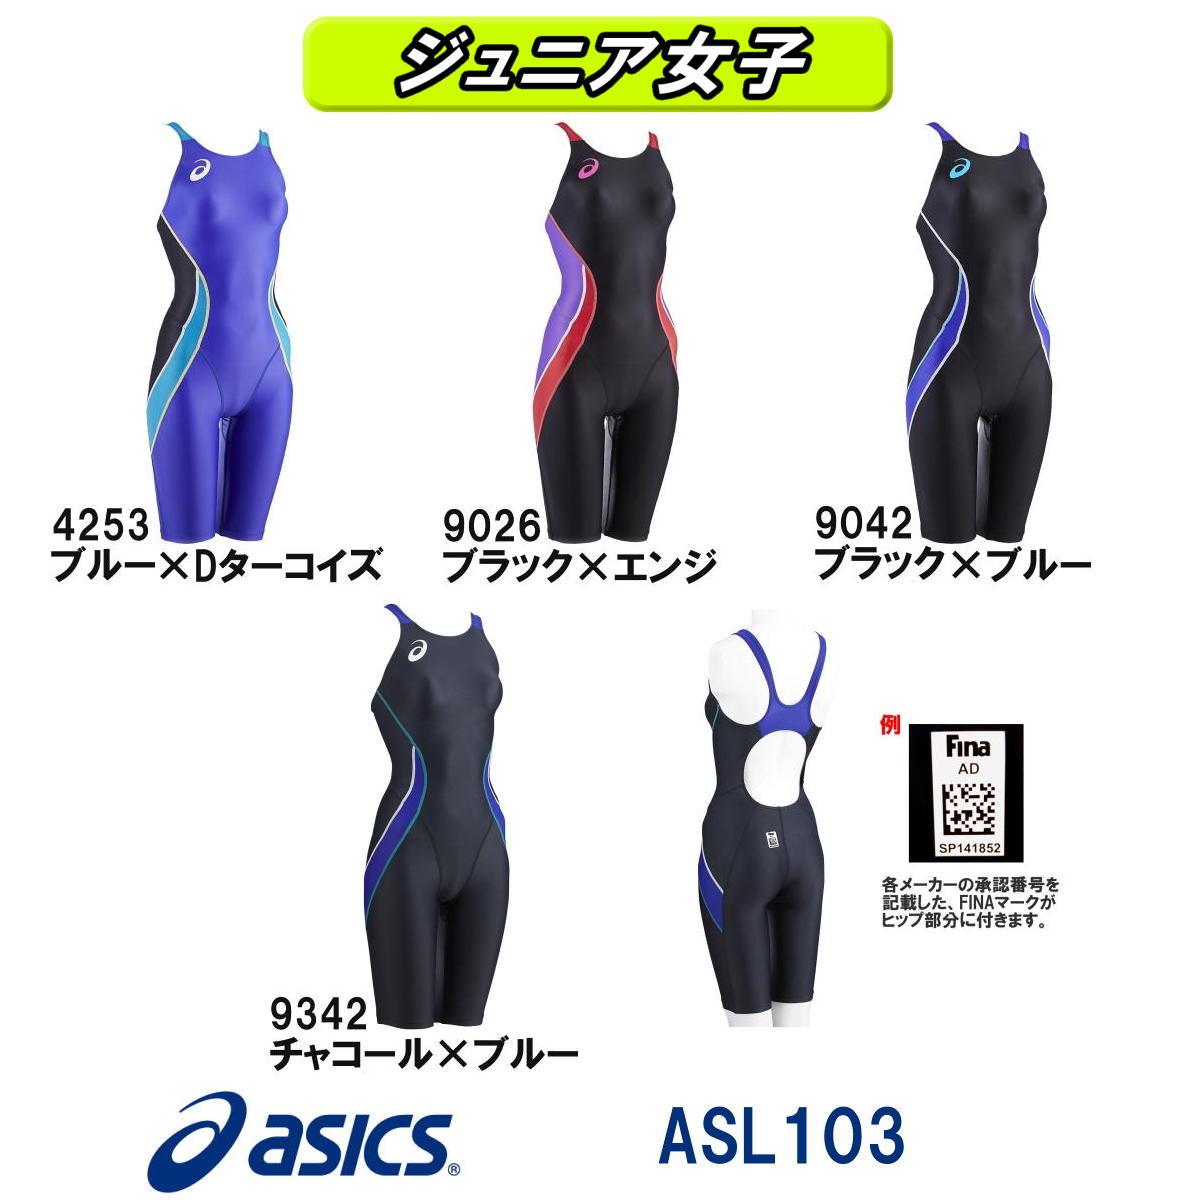 【ASL103】asics(アシックス)ジュニア女子競泳水着SPURTeX